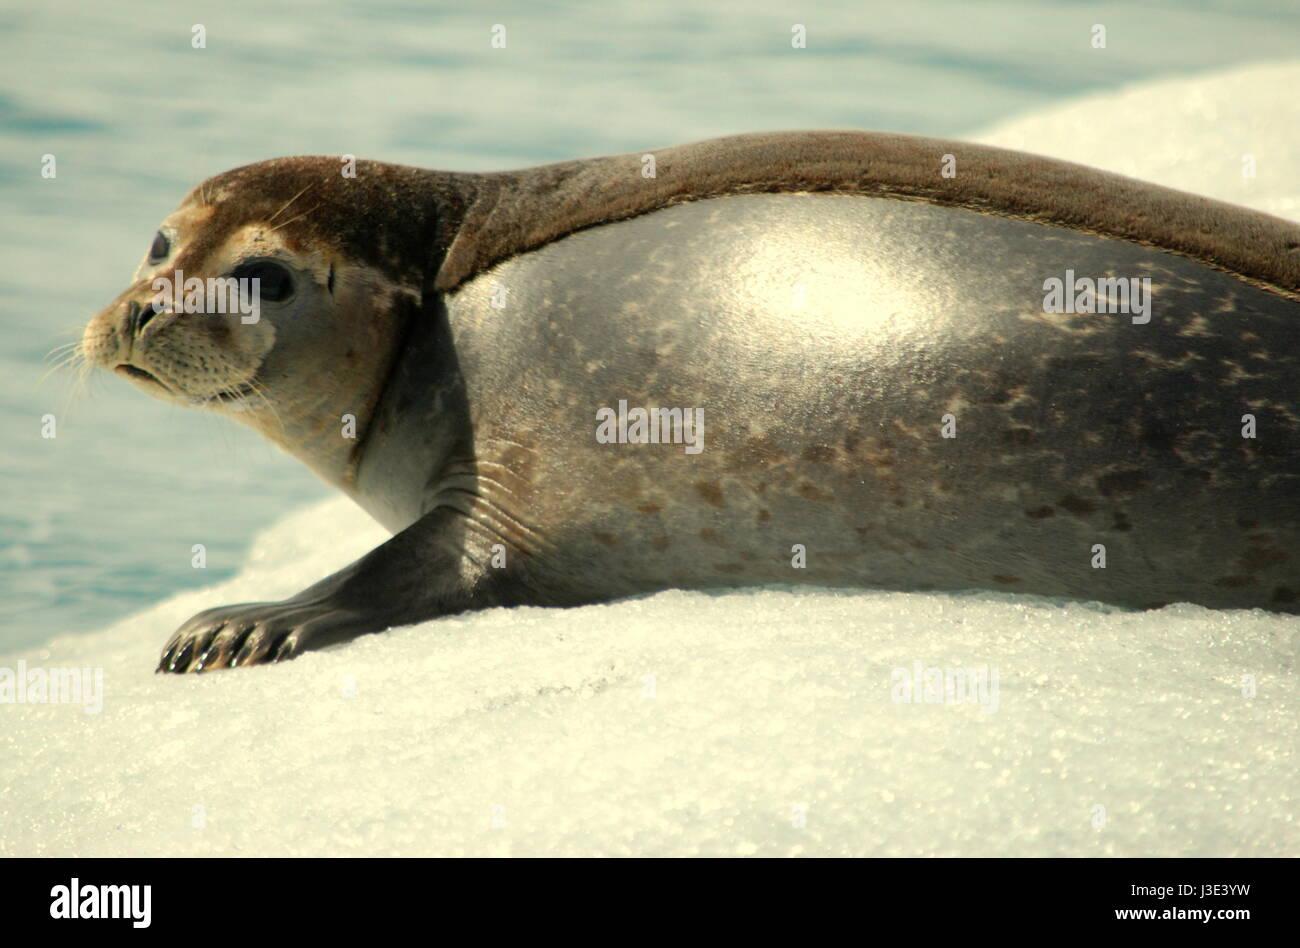 Grey seal (Halichoerus grypus), Jökulsárlón lake, Iceland, Europe - Stock Image